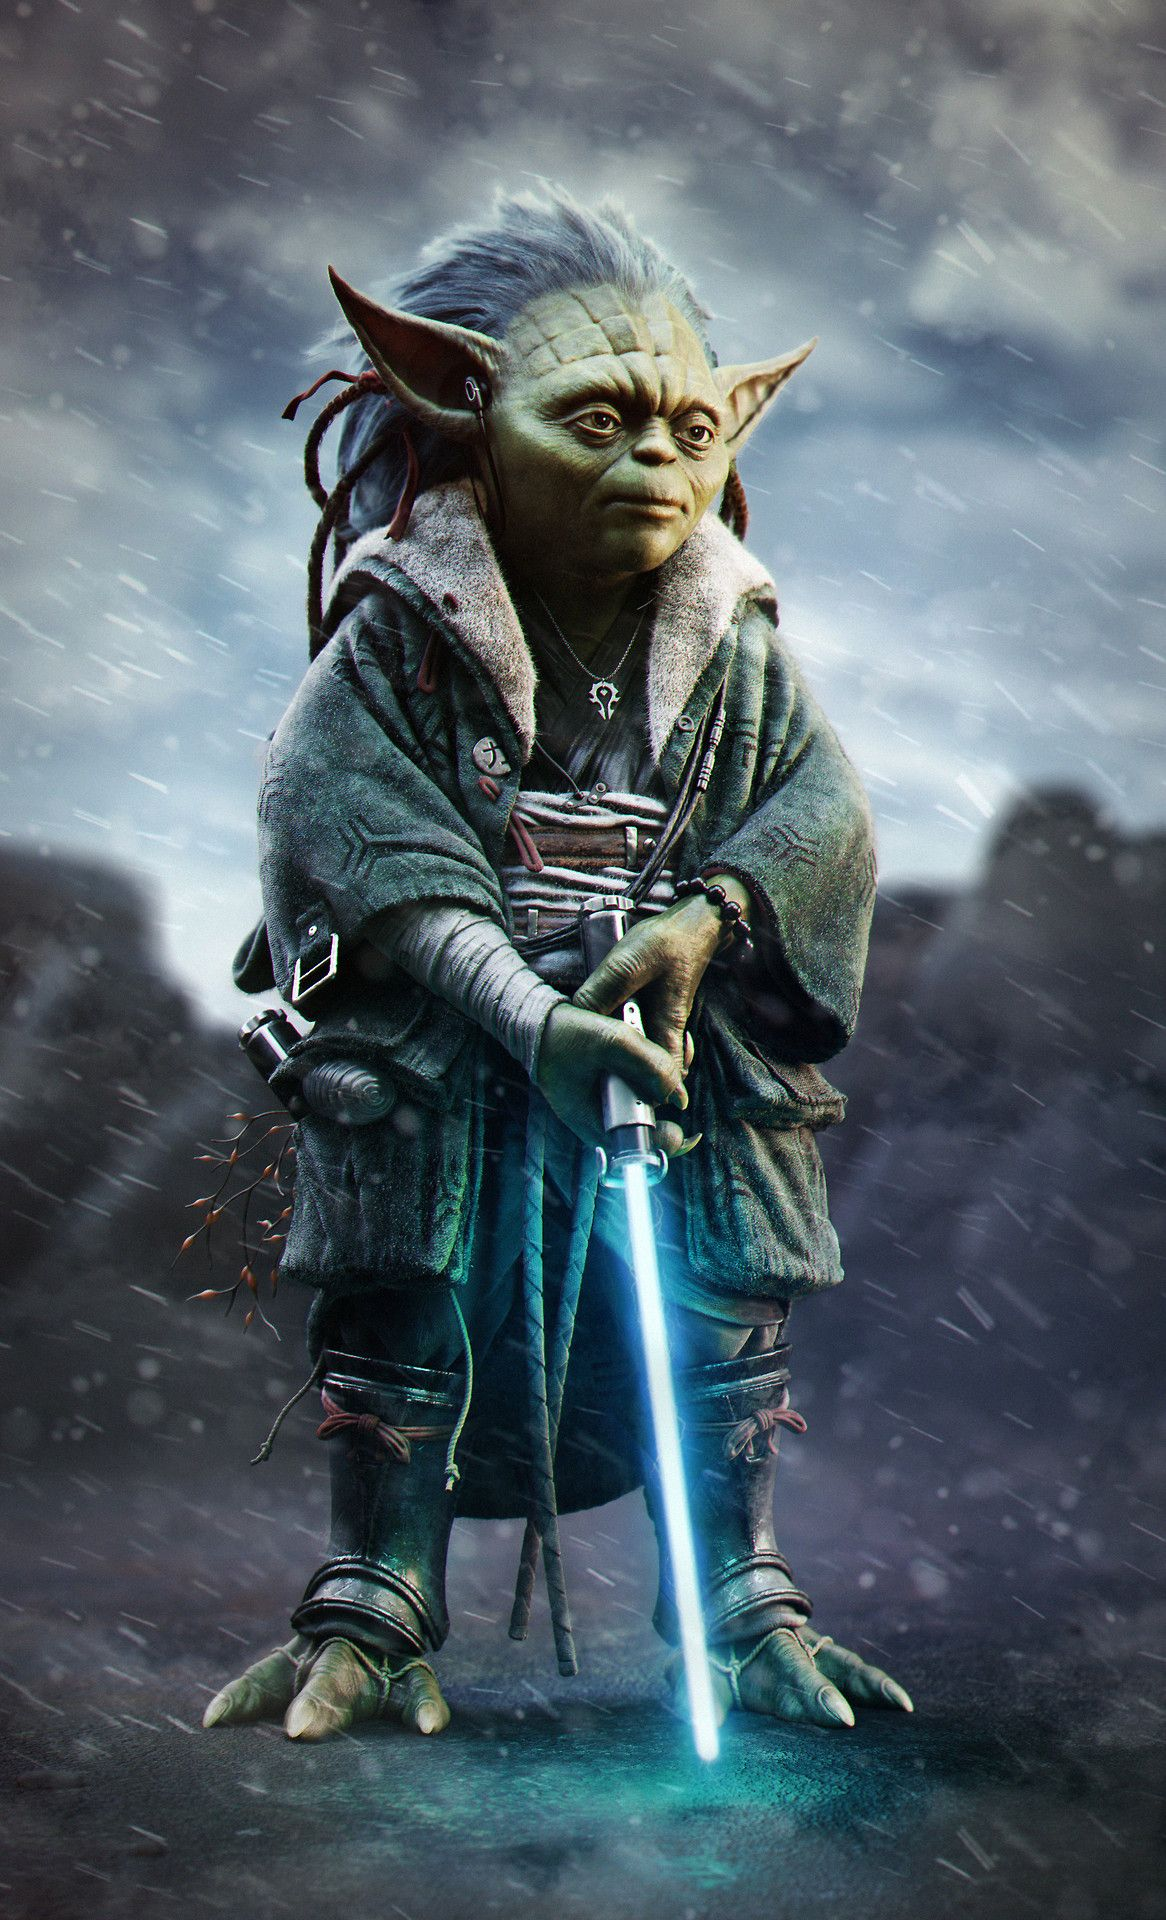 Star Wars Jedi Character Concept Art